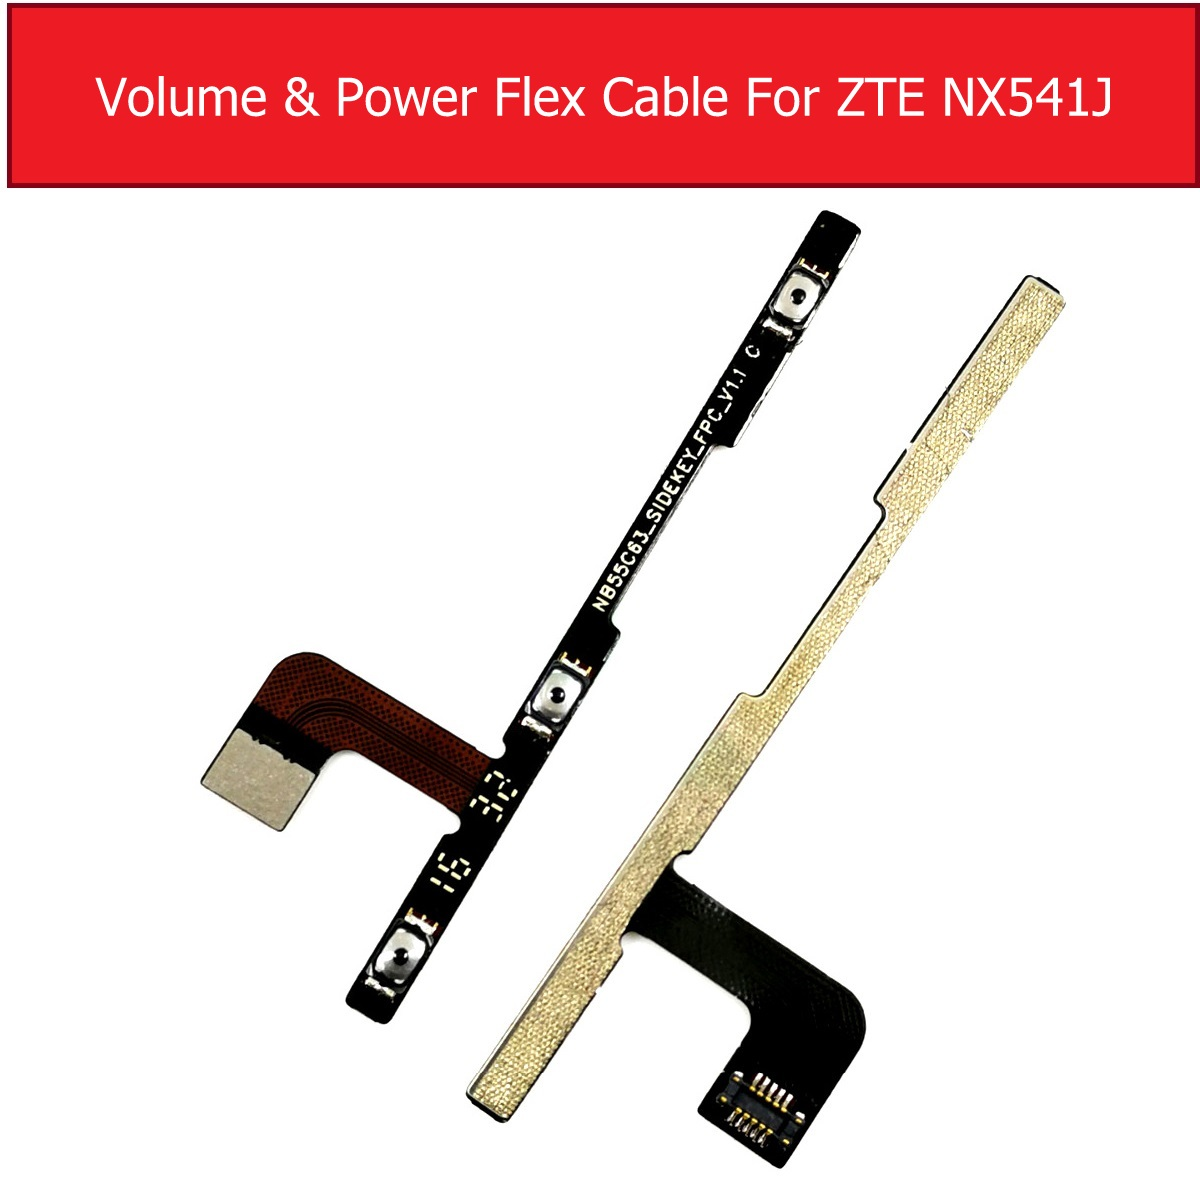 Genuine Power & Volume Flex Cable For ZTE Nubia N1 NX541J Volume & Power Side key Button Switch Flex Ribbon Replacement RepairGenuine Power & Volume Flex Cable For ZTE Nubia N1 NX541J Volume & Power Side key Button Switch Flex Ribbon Replacement Repair